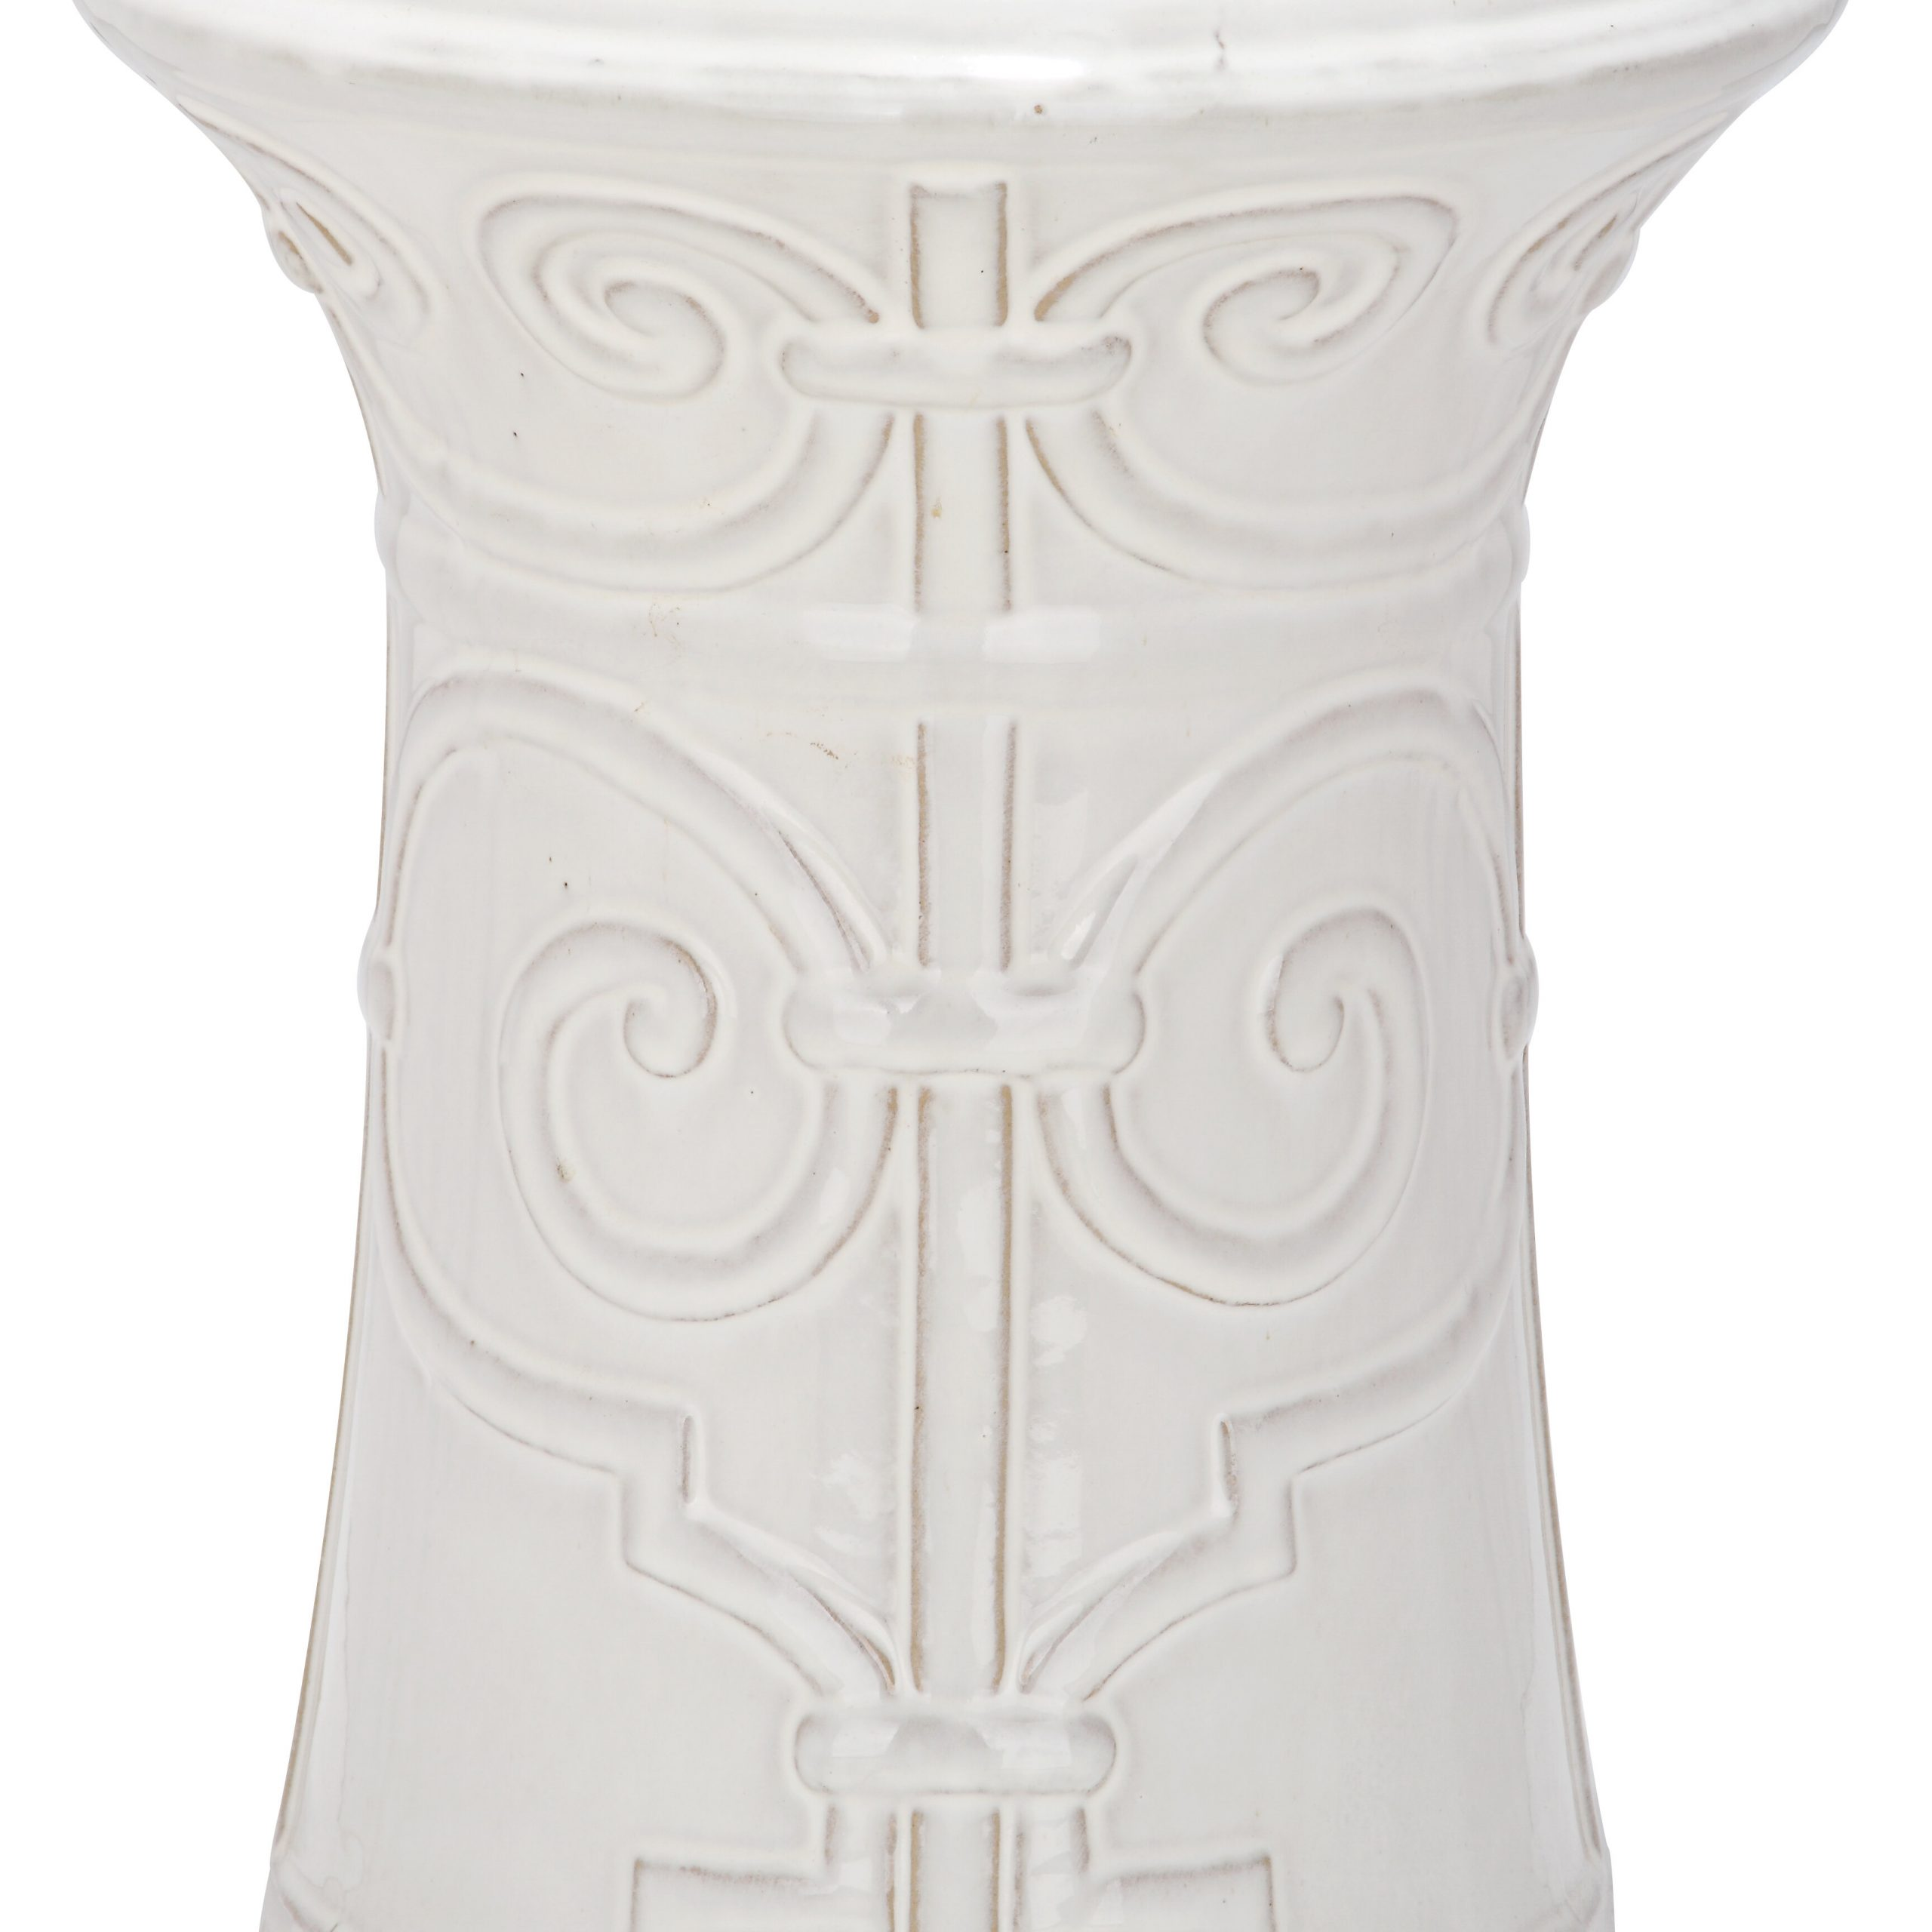 Imperial Ceramic Garden Stool Regarding Winterview Garden Stools (View 13 of 25)